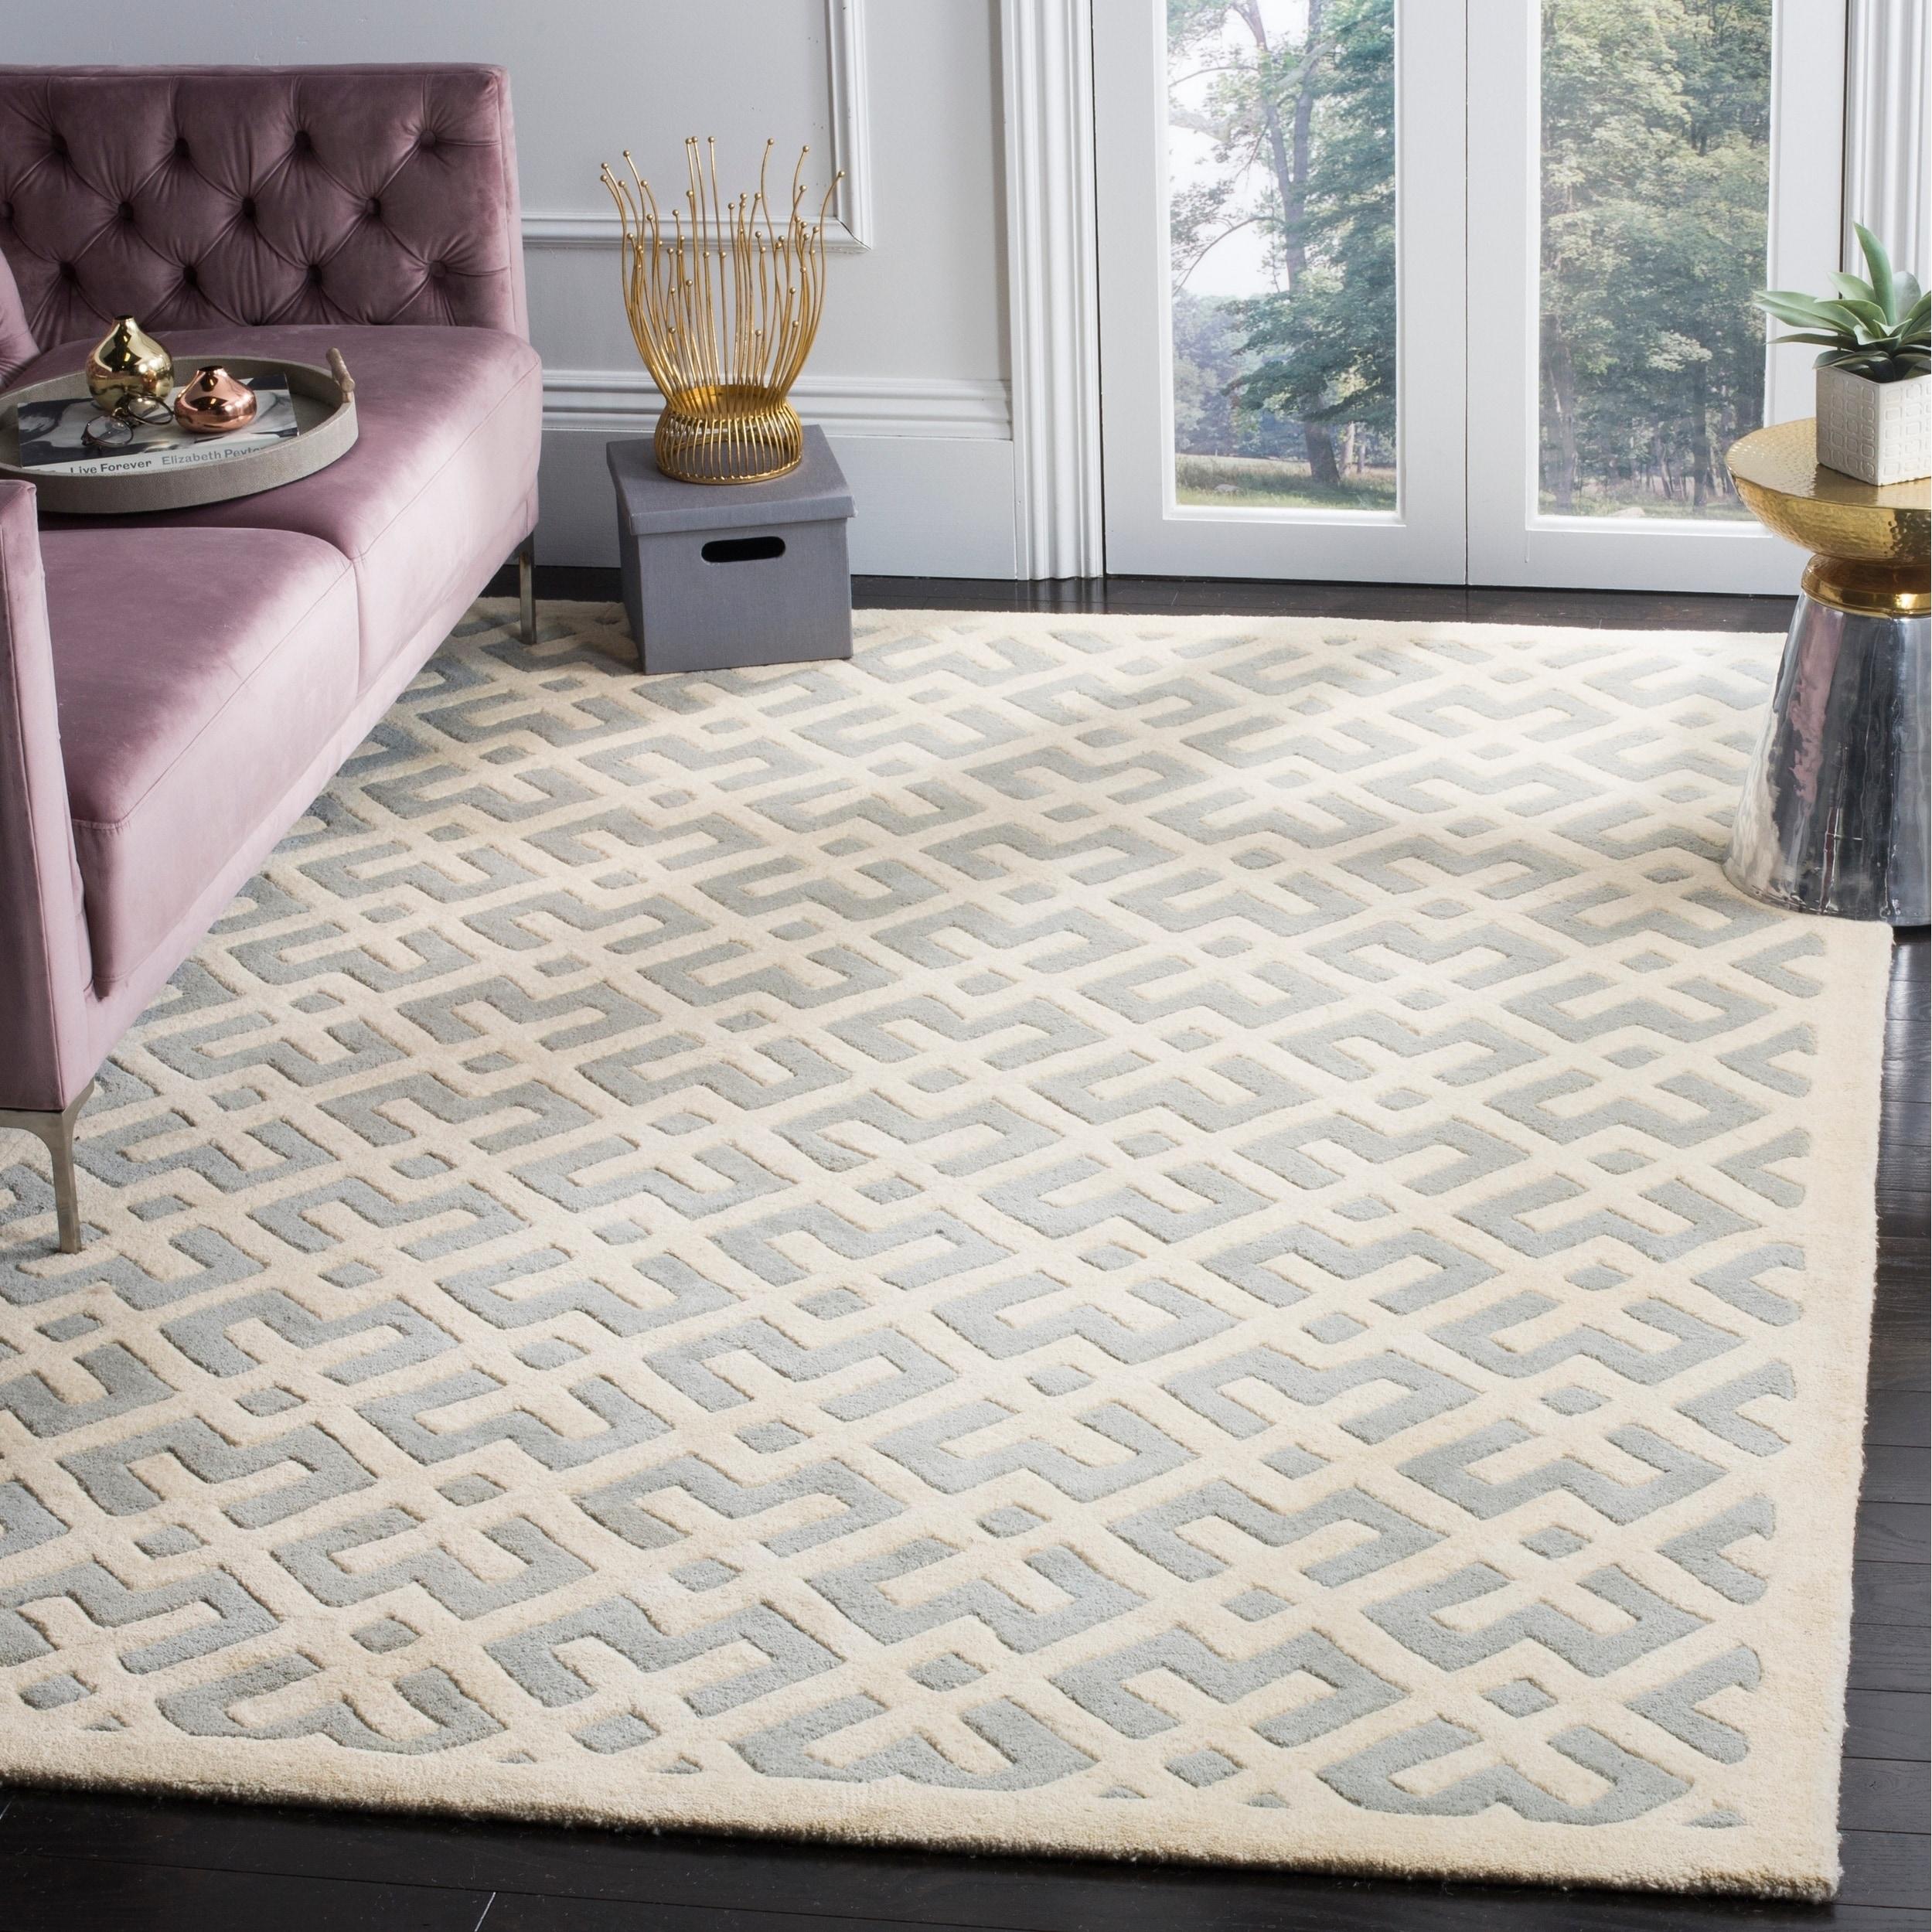 Safavieh Handmade Moroccan Chatham Rectangular Gray Wool Rug (8' x 10') at Sears.com